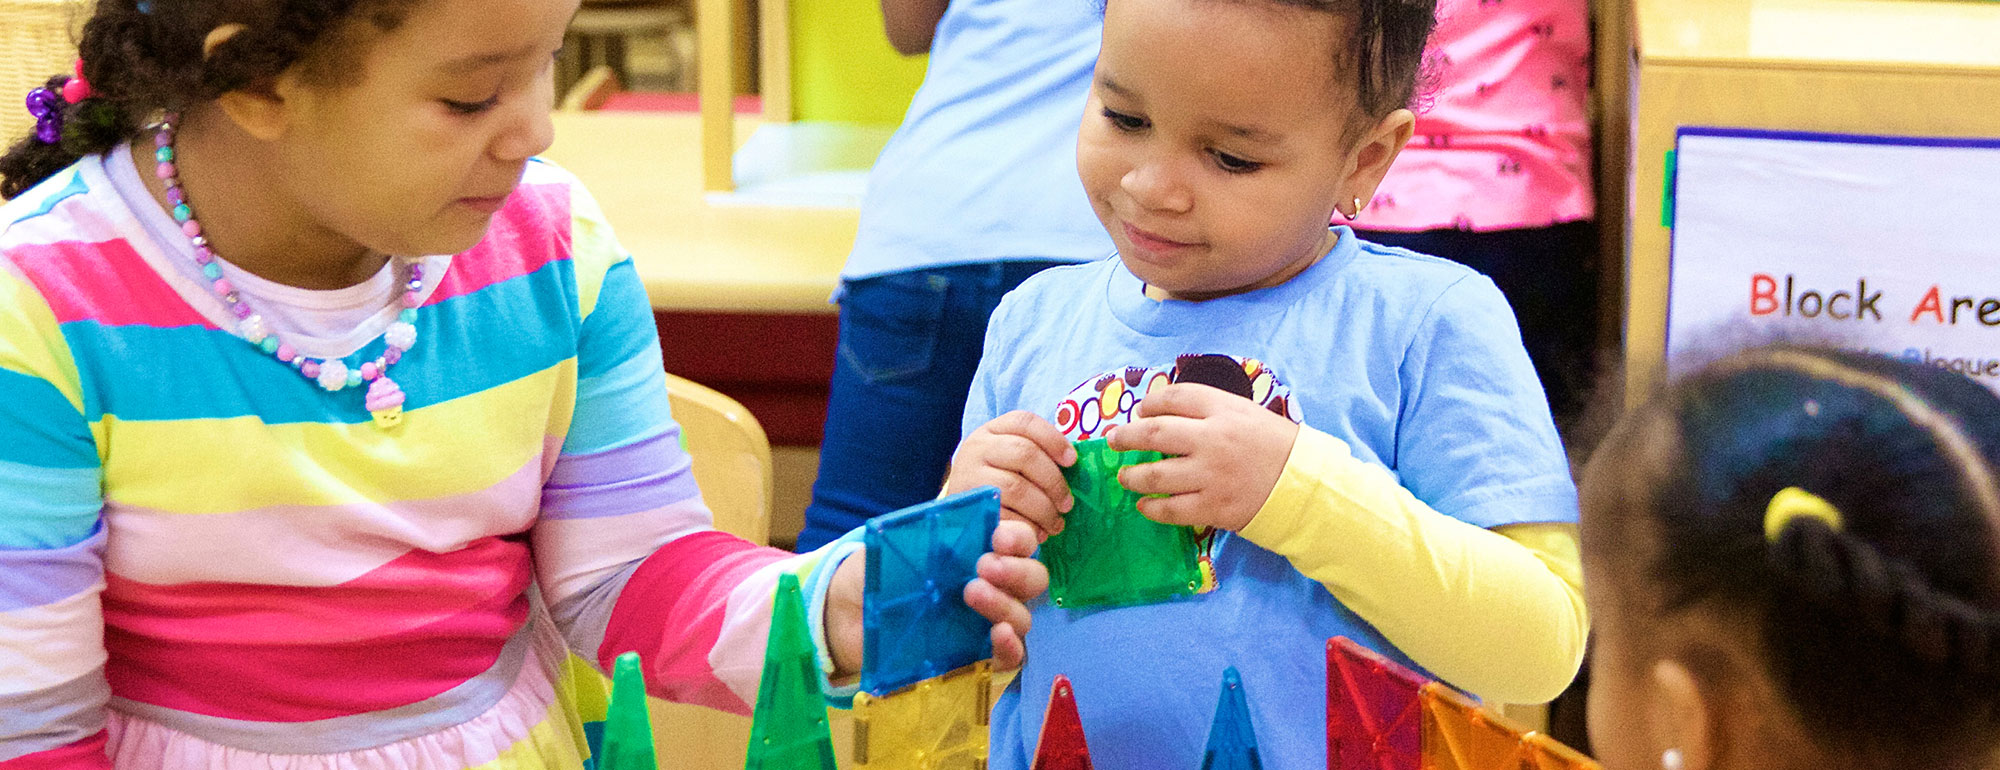 Brooklyn Kindergarten Society Full Day Preschool